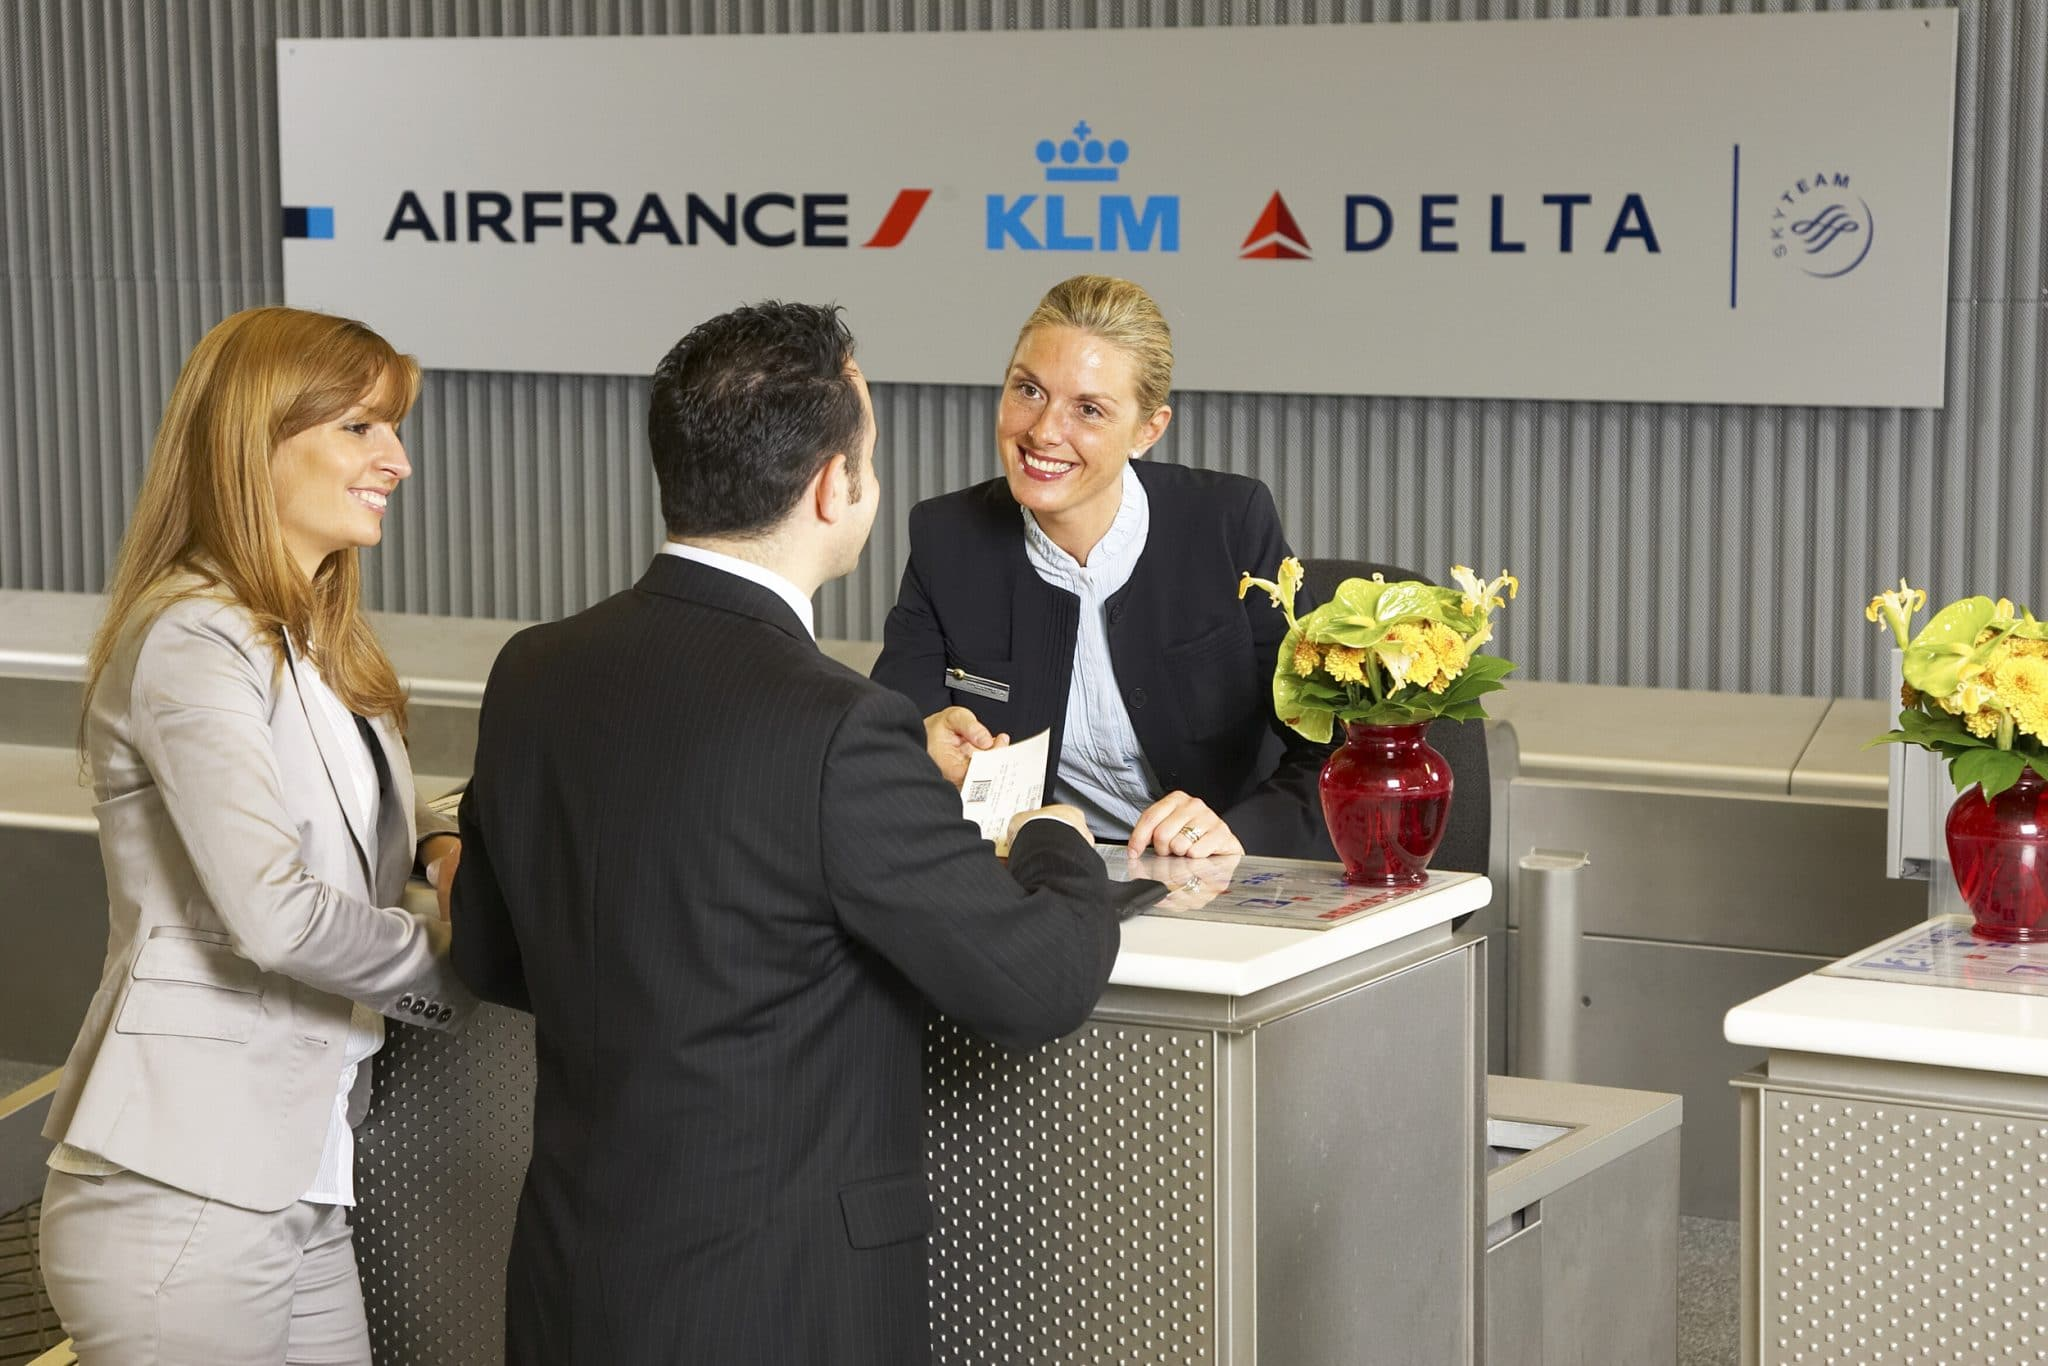 Enregistrement des bagages Air France: enregistrement en ligne et aéroport